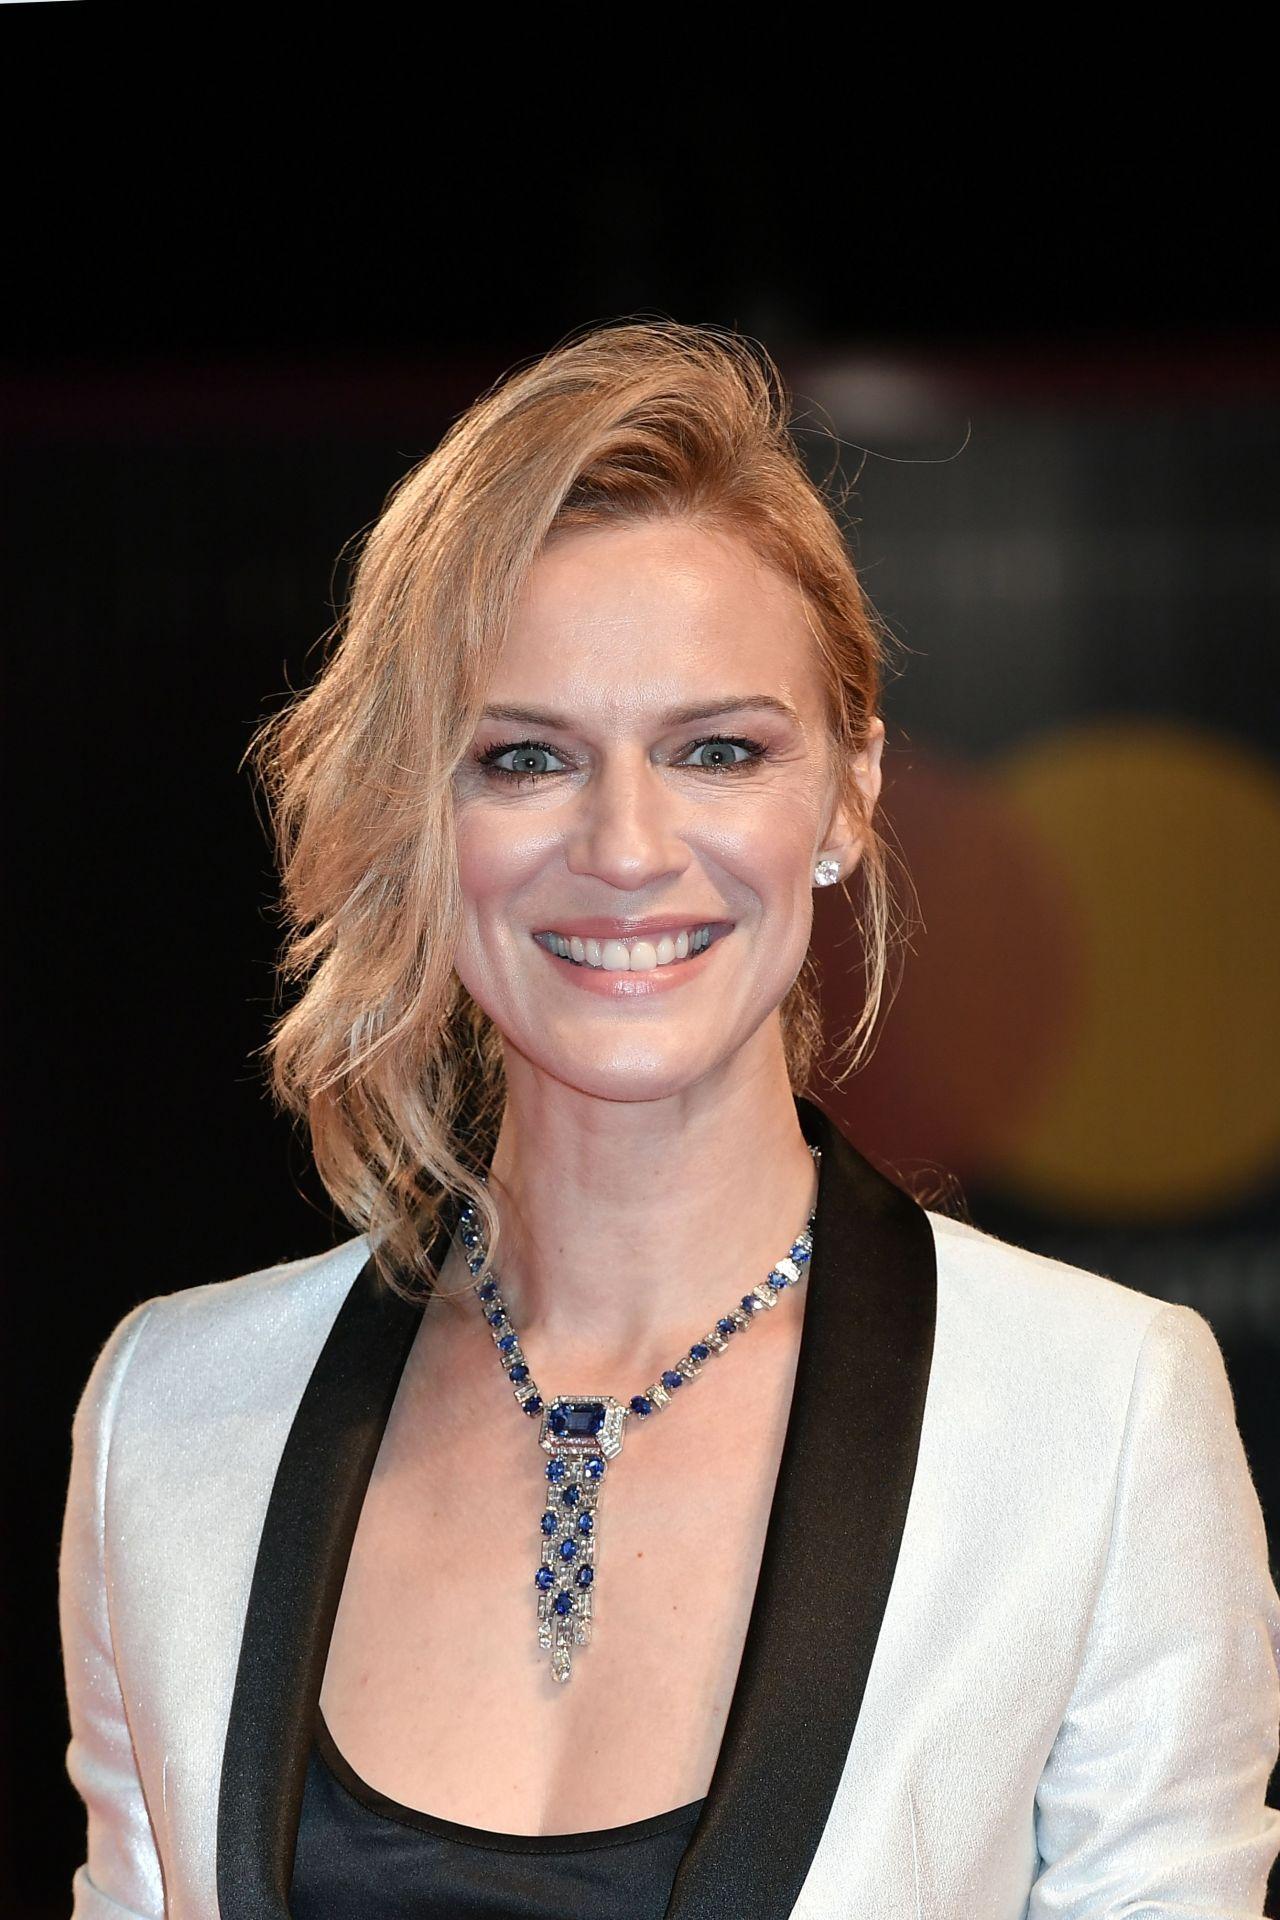 Kirsten Vangsness born July 7, 1972 (age 46) photo